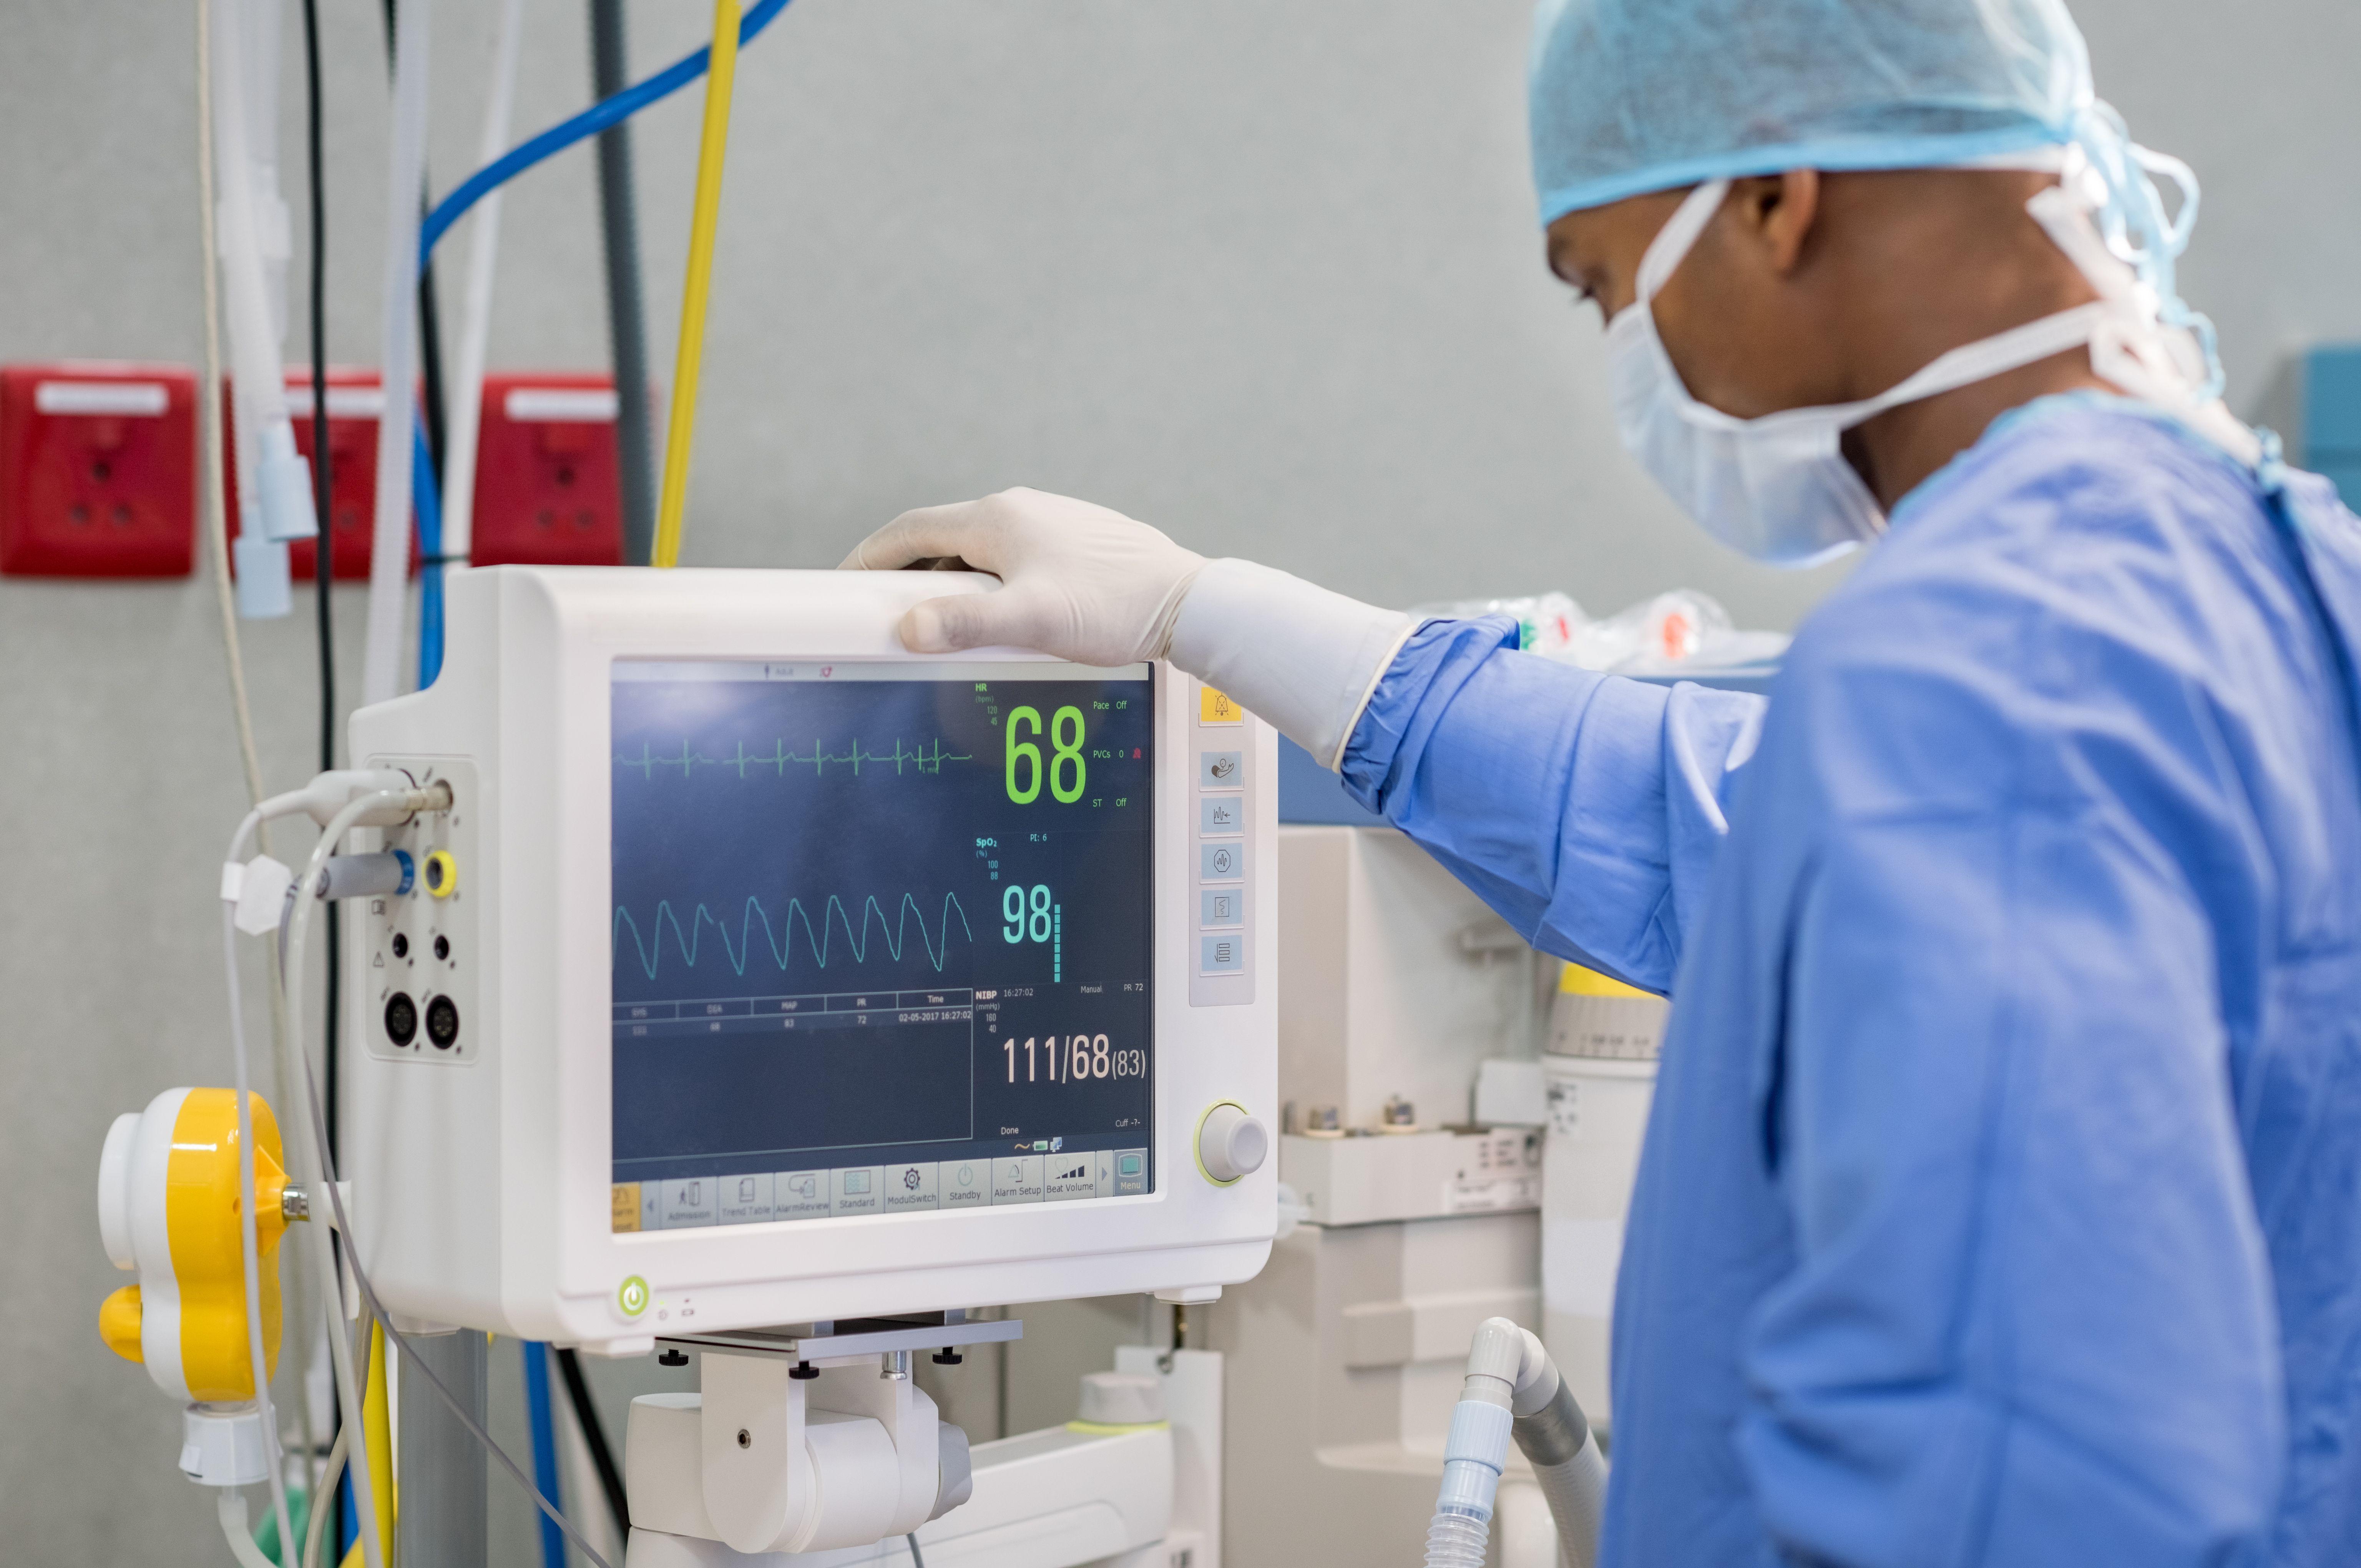 heart-rate-monitor-in-hospital-theater-PYG8W2Z.jpg